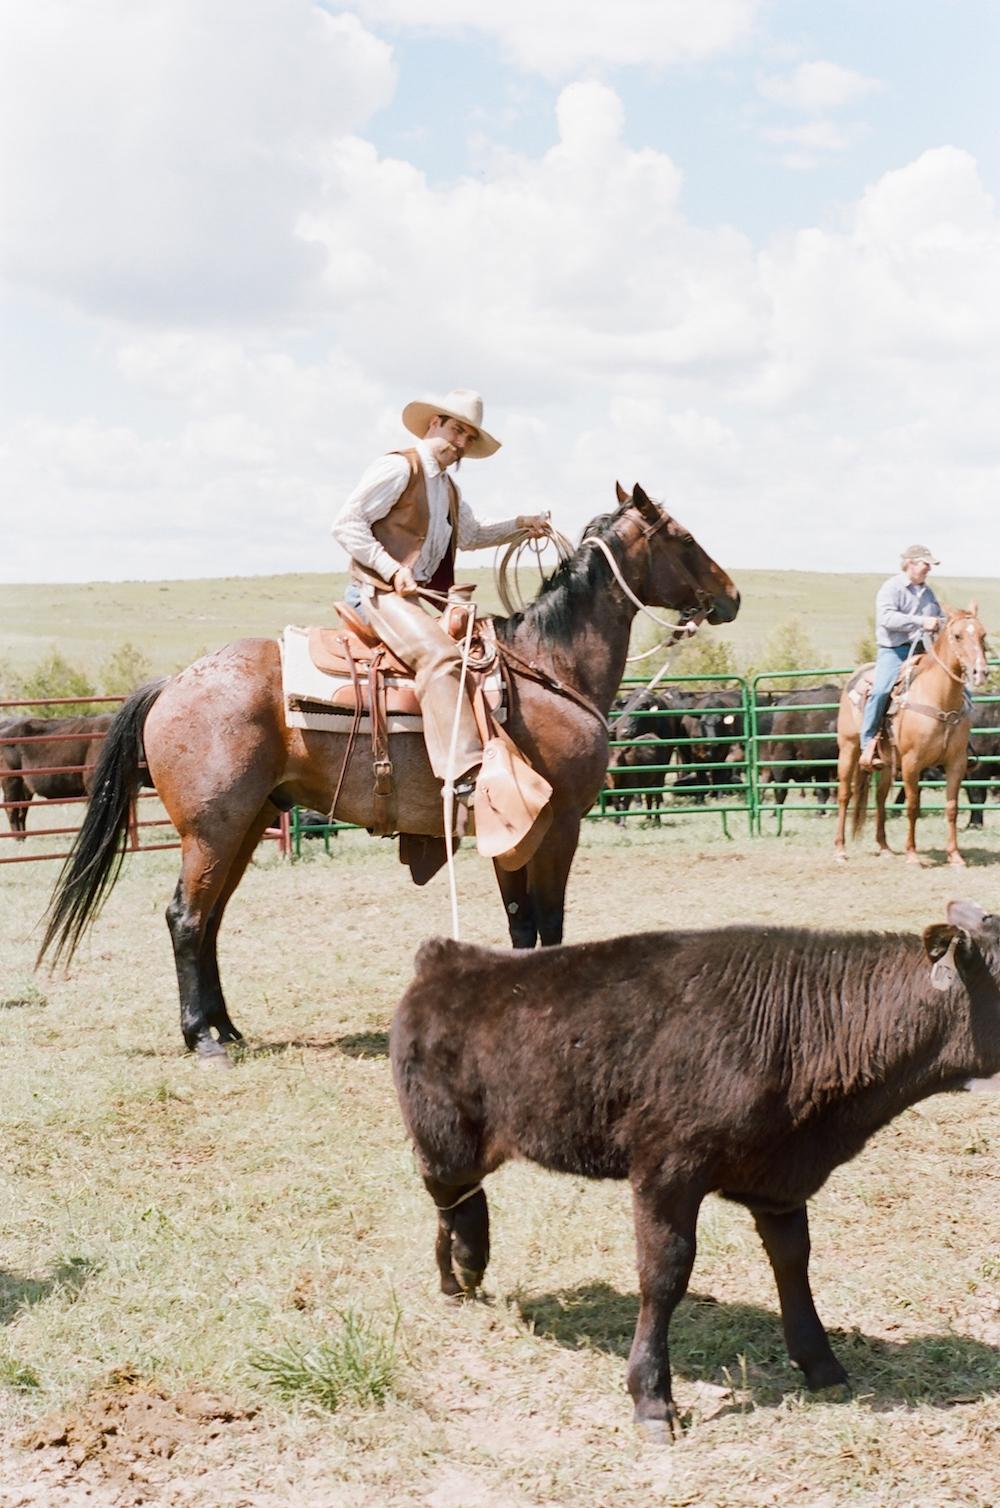 cowboy roping a calf